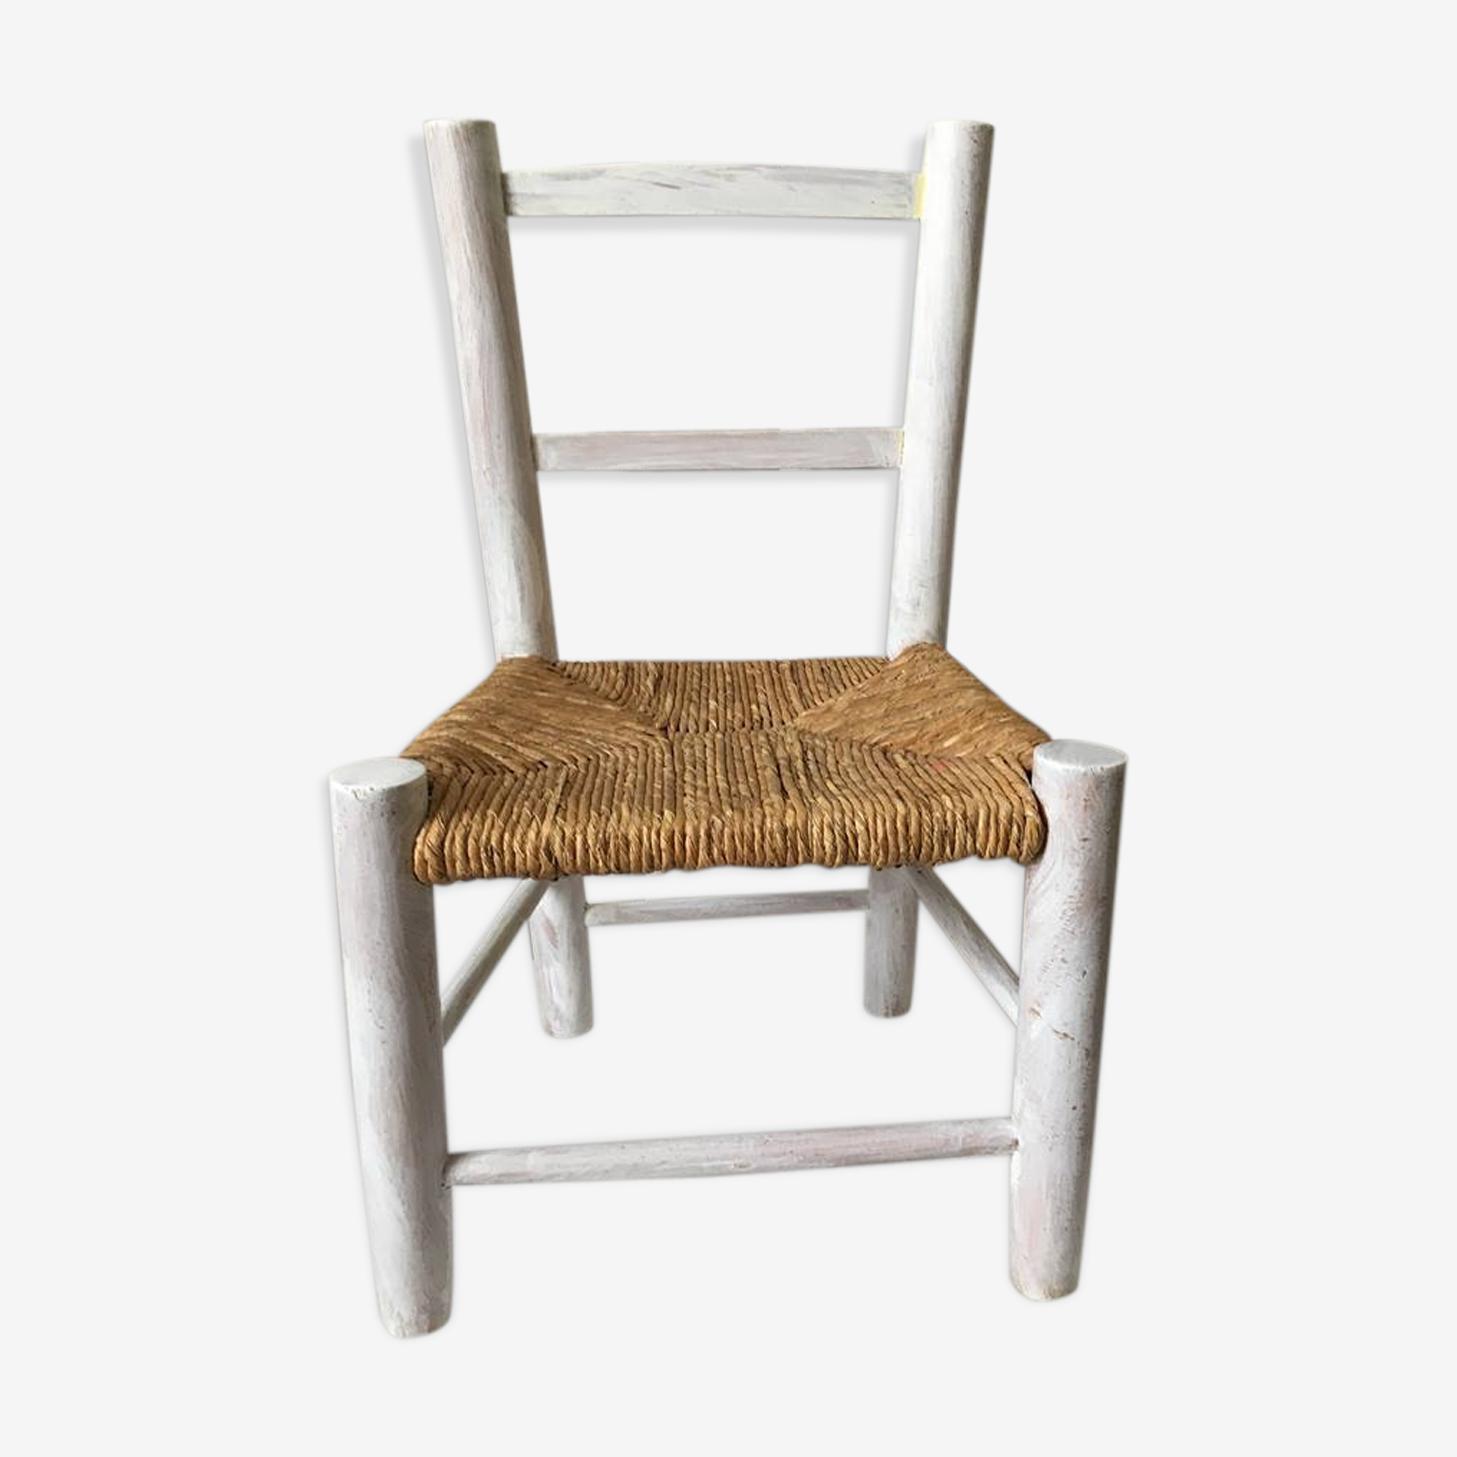 Chair child bohemian style